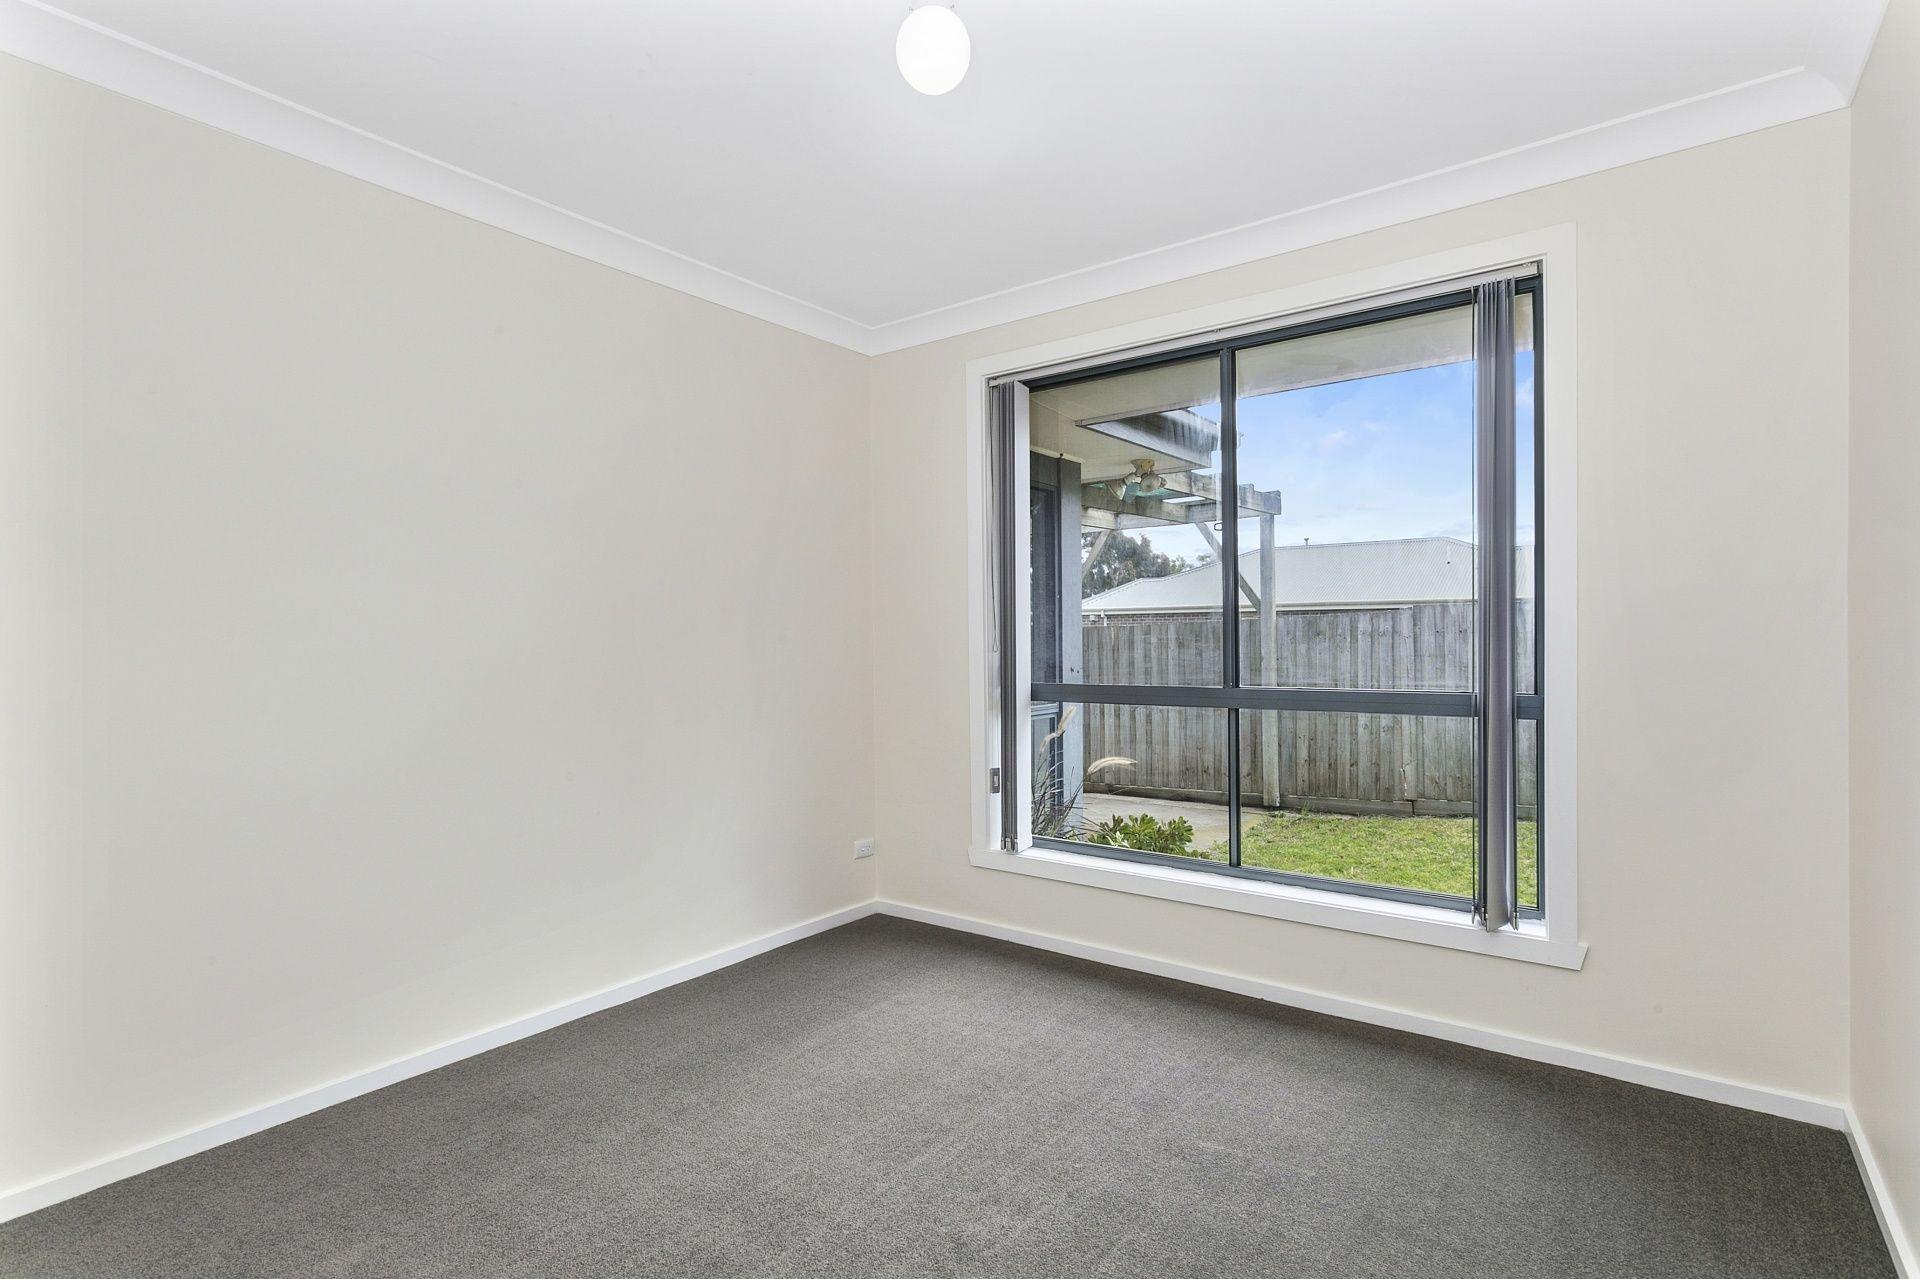 Sold property 500000 for 28 belvedere terrace ocean for 123 the terrace ocean grove